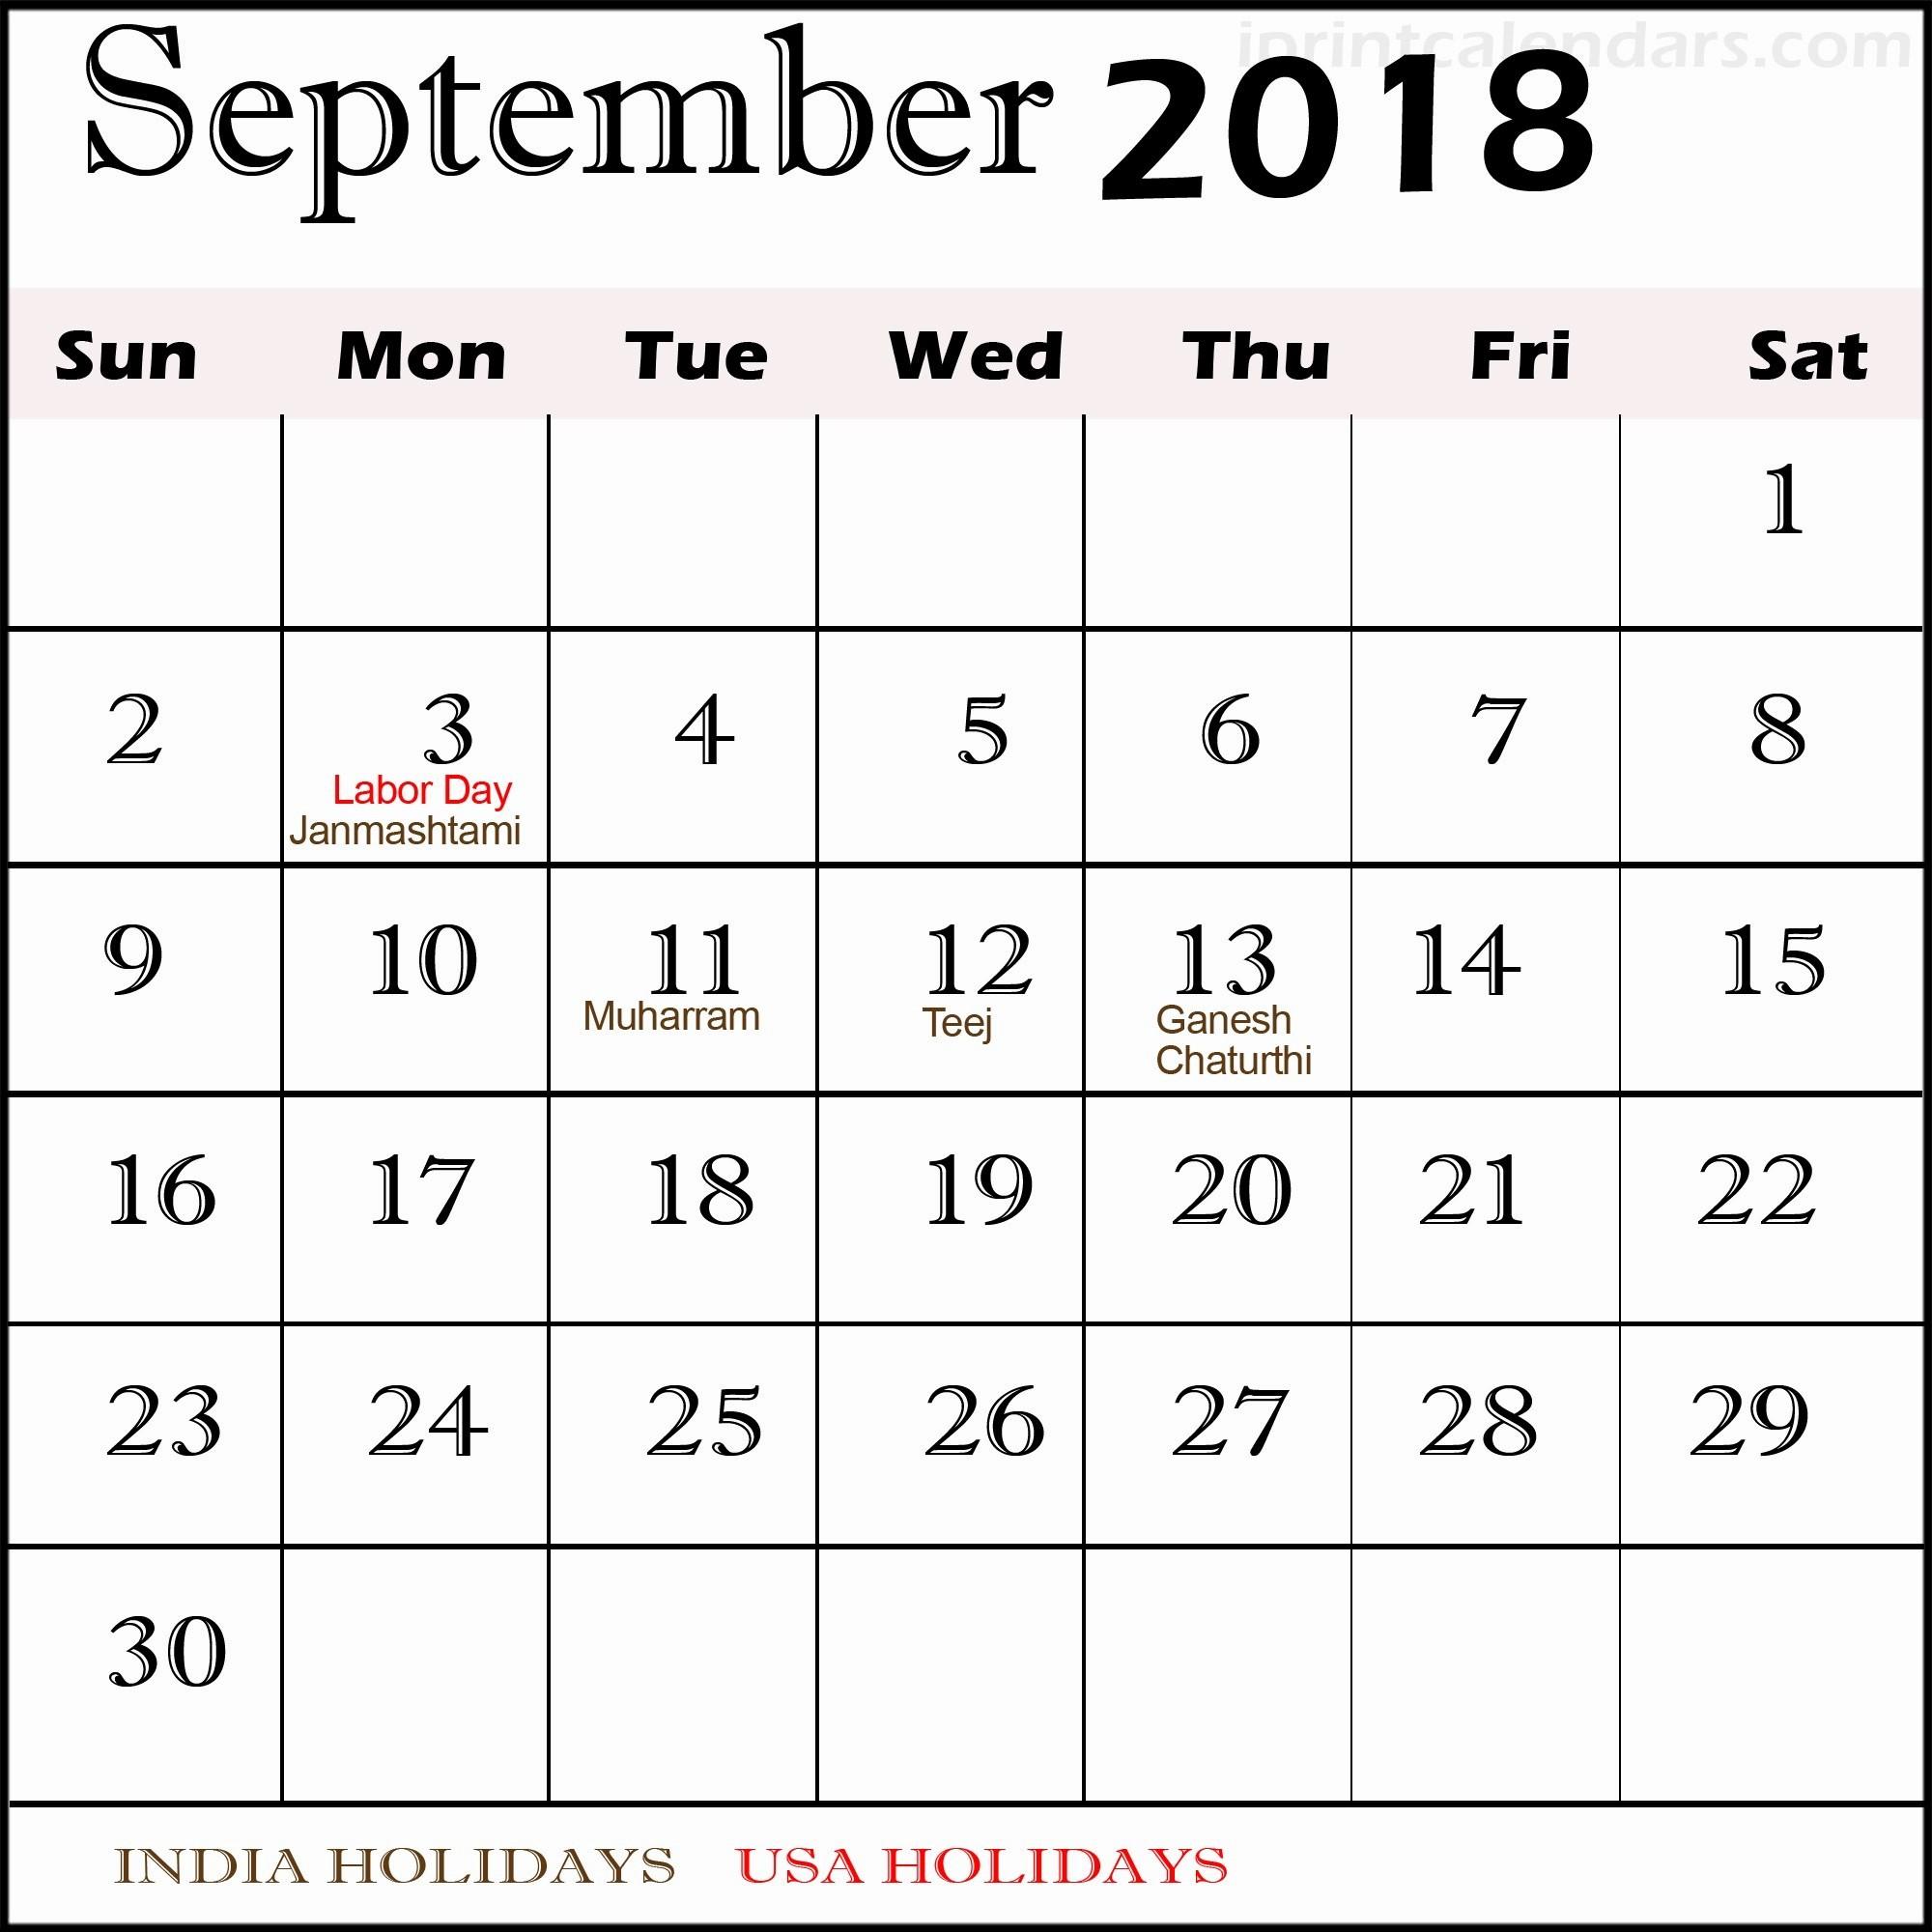 Calendar 2018 Printable with Holidays Elegant September 2018 Calendar with Holidays